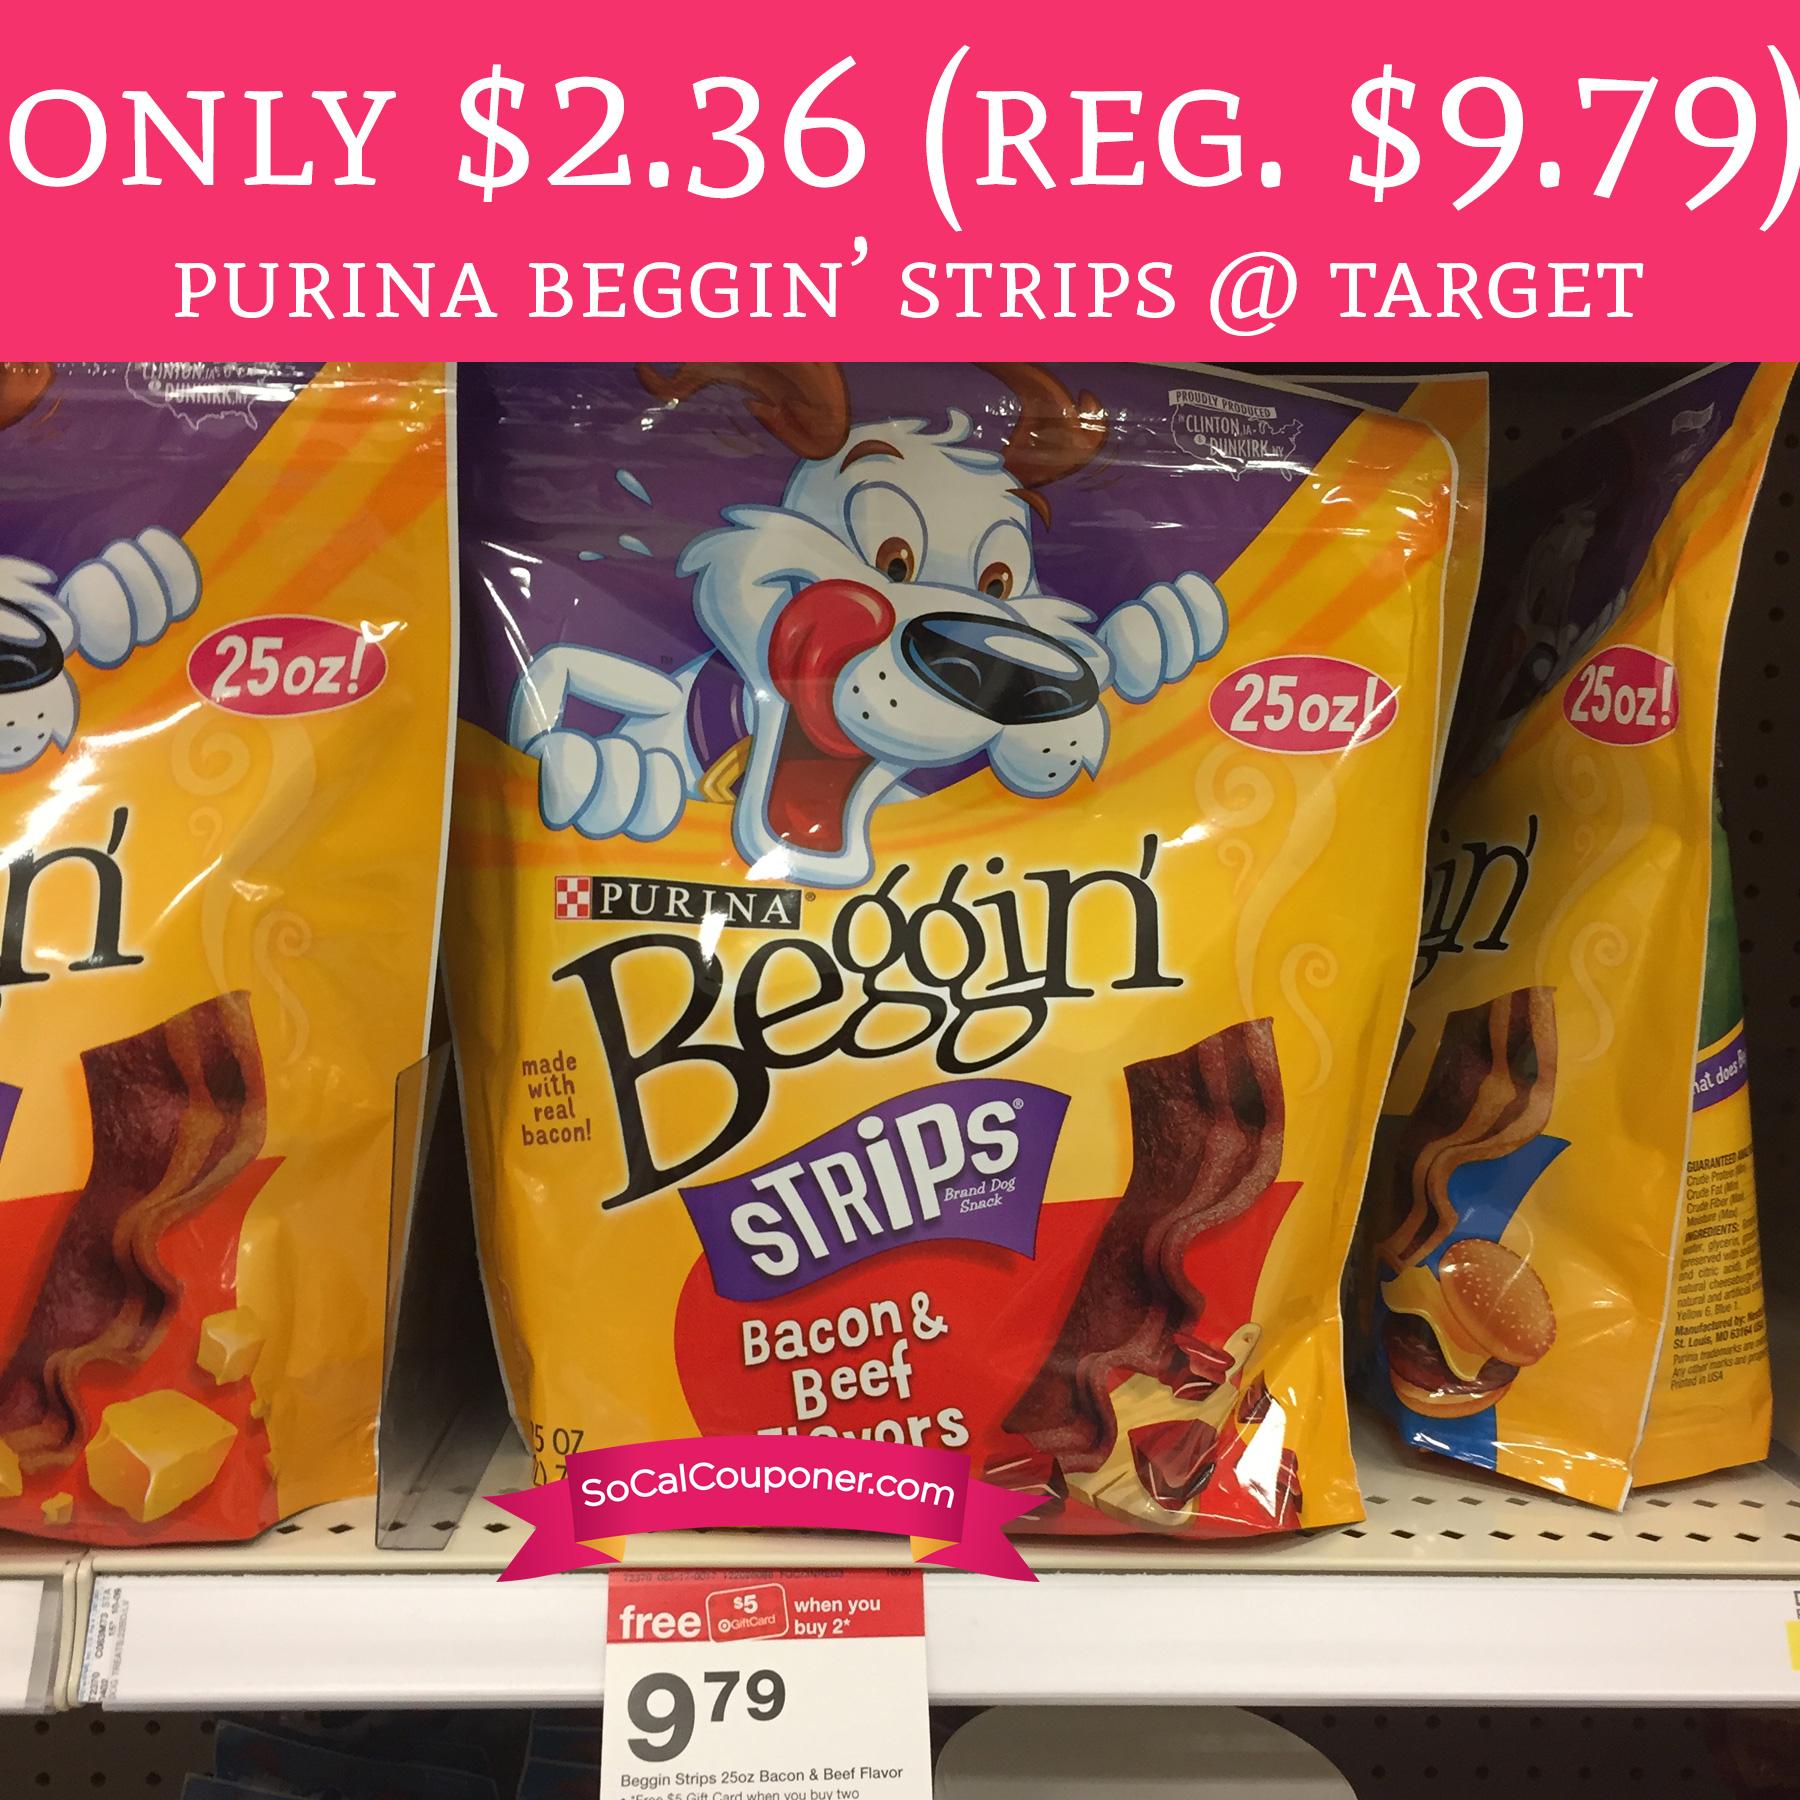 Bogo beggin strips coupon 2018